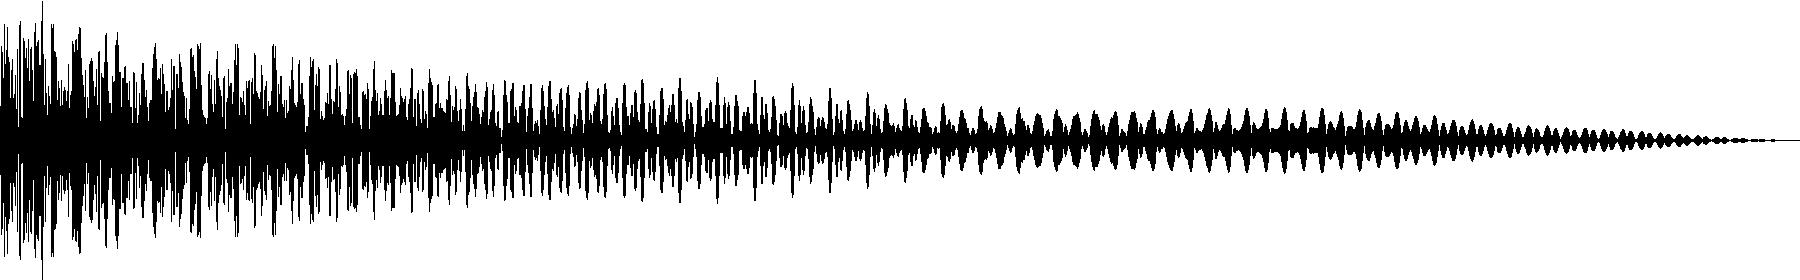 vedh synth cut 156 c